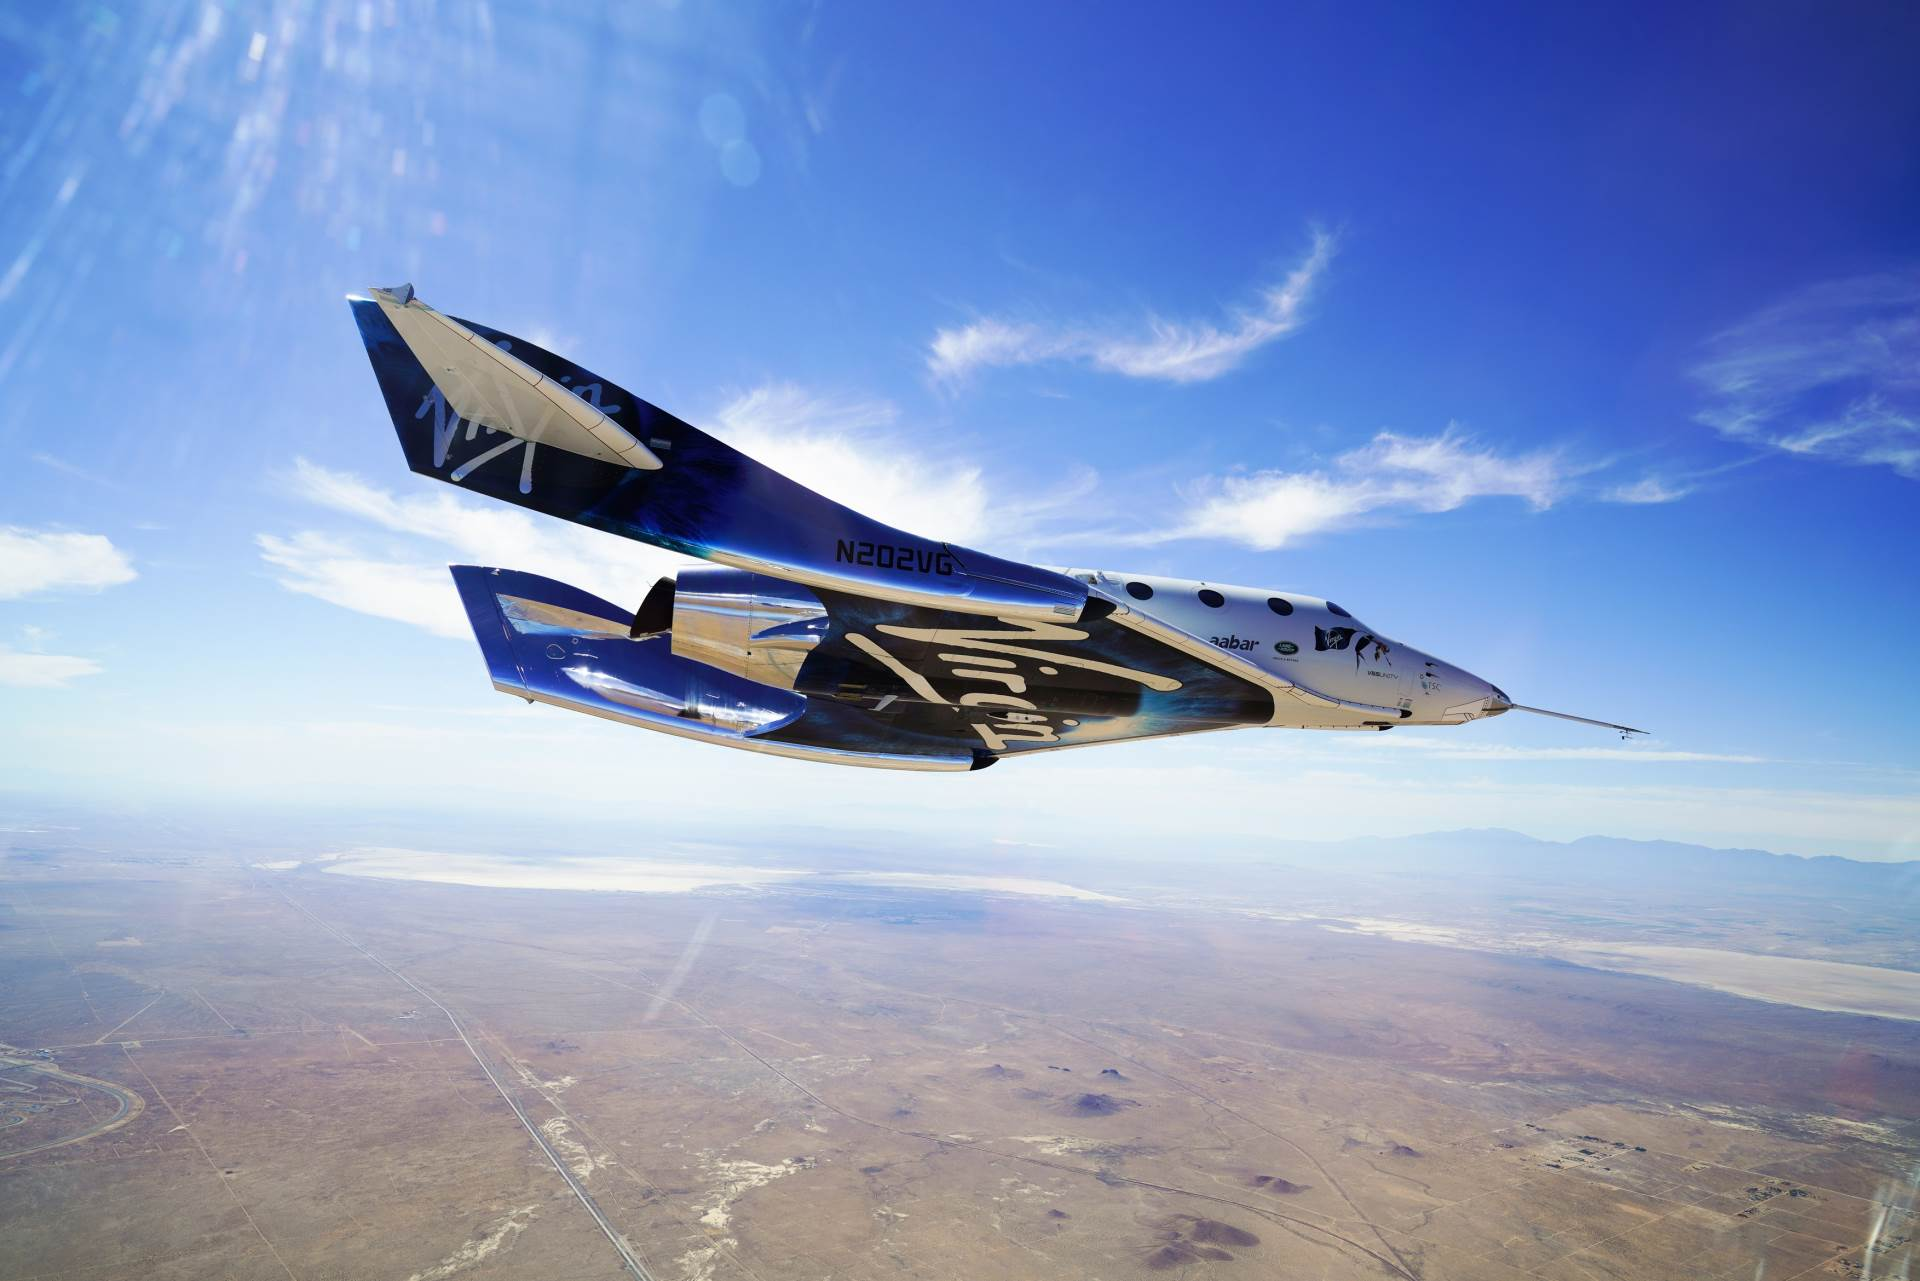 Virgin Galactic svemirska letjelica